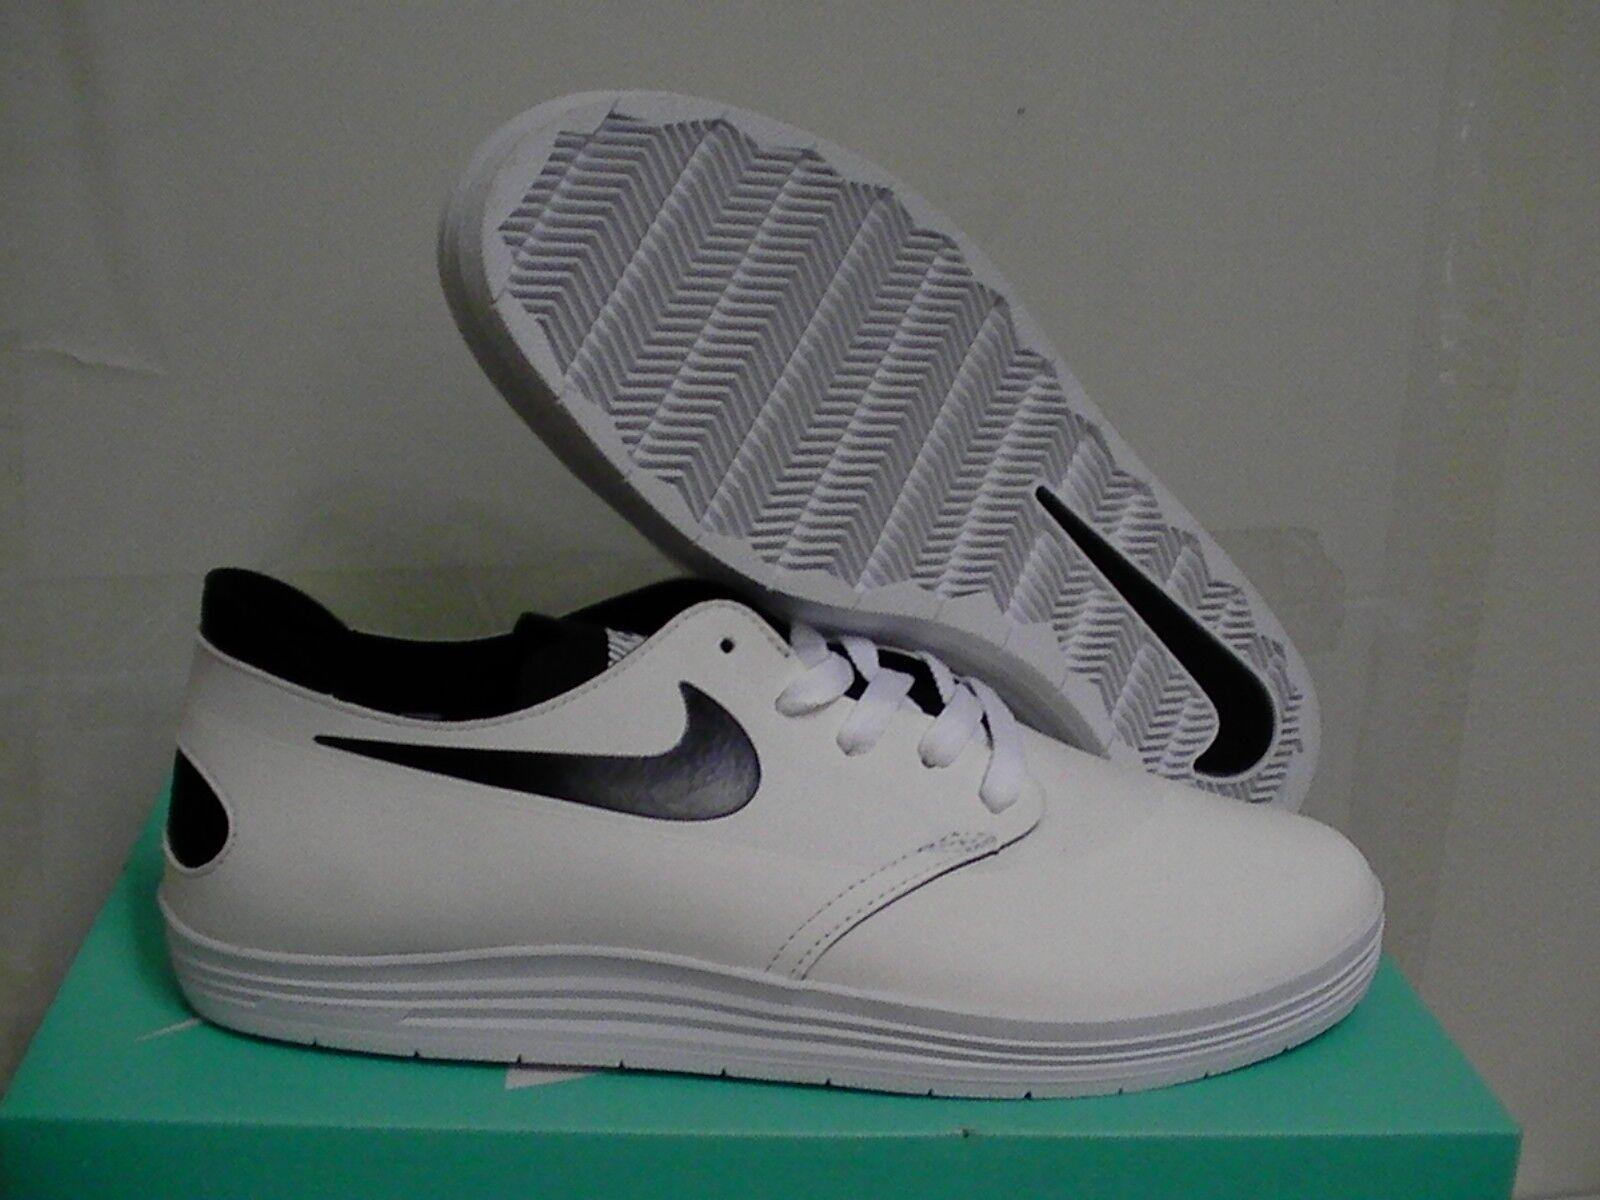 Nike mens lunar SB oneshot size 10.5 us new with box